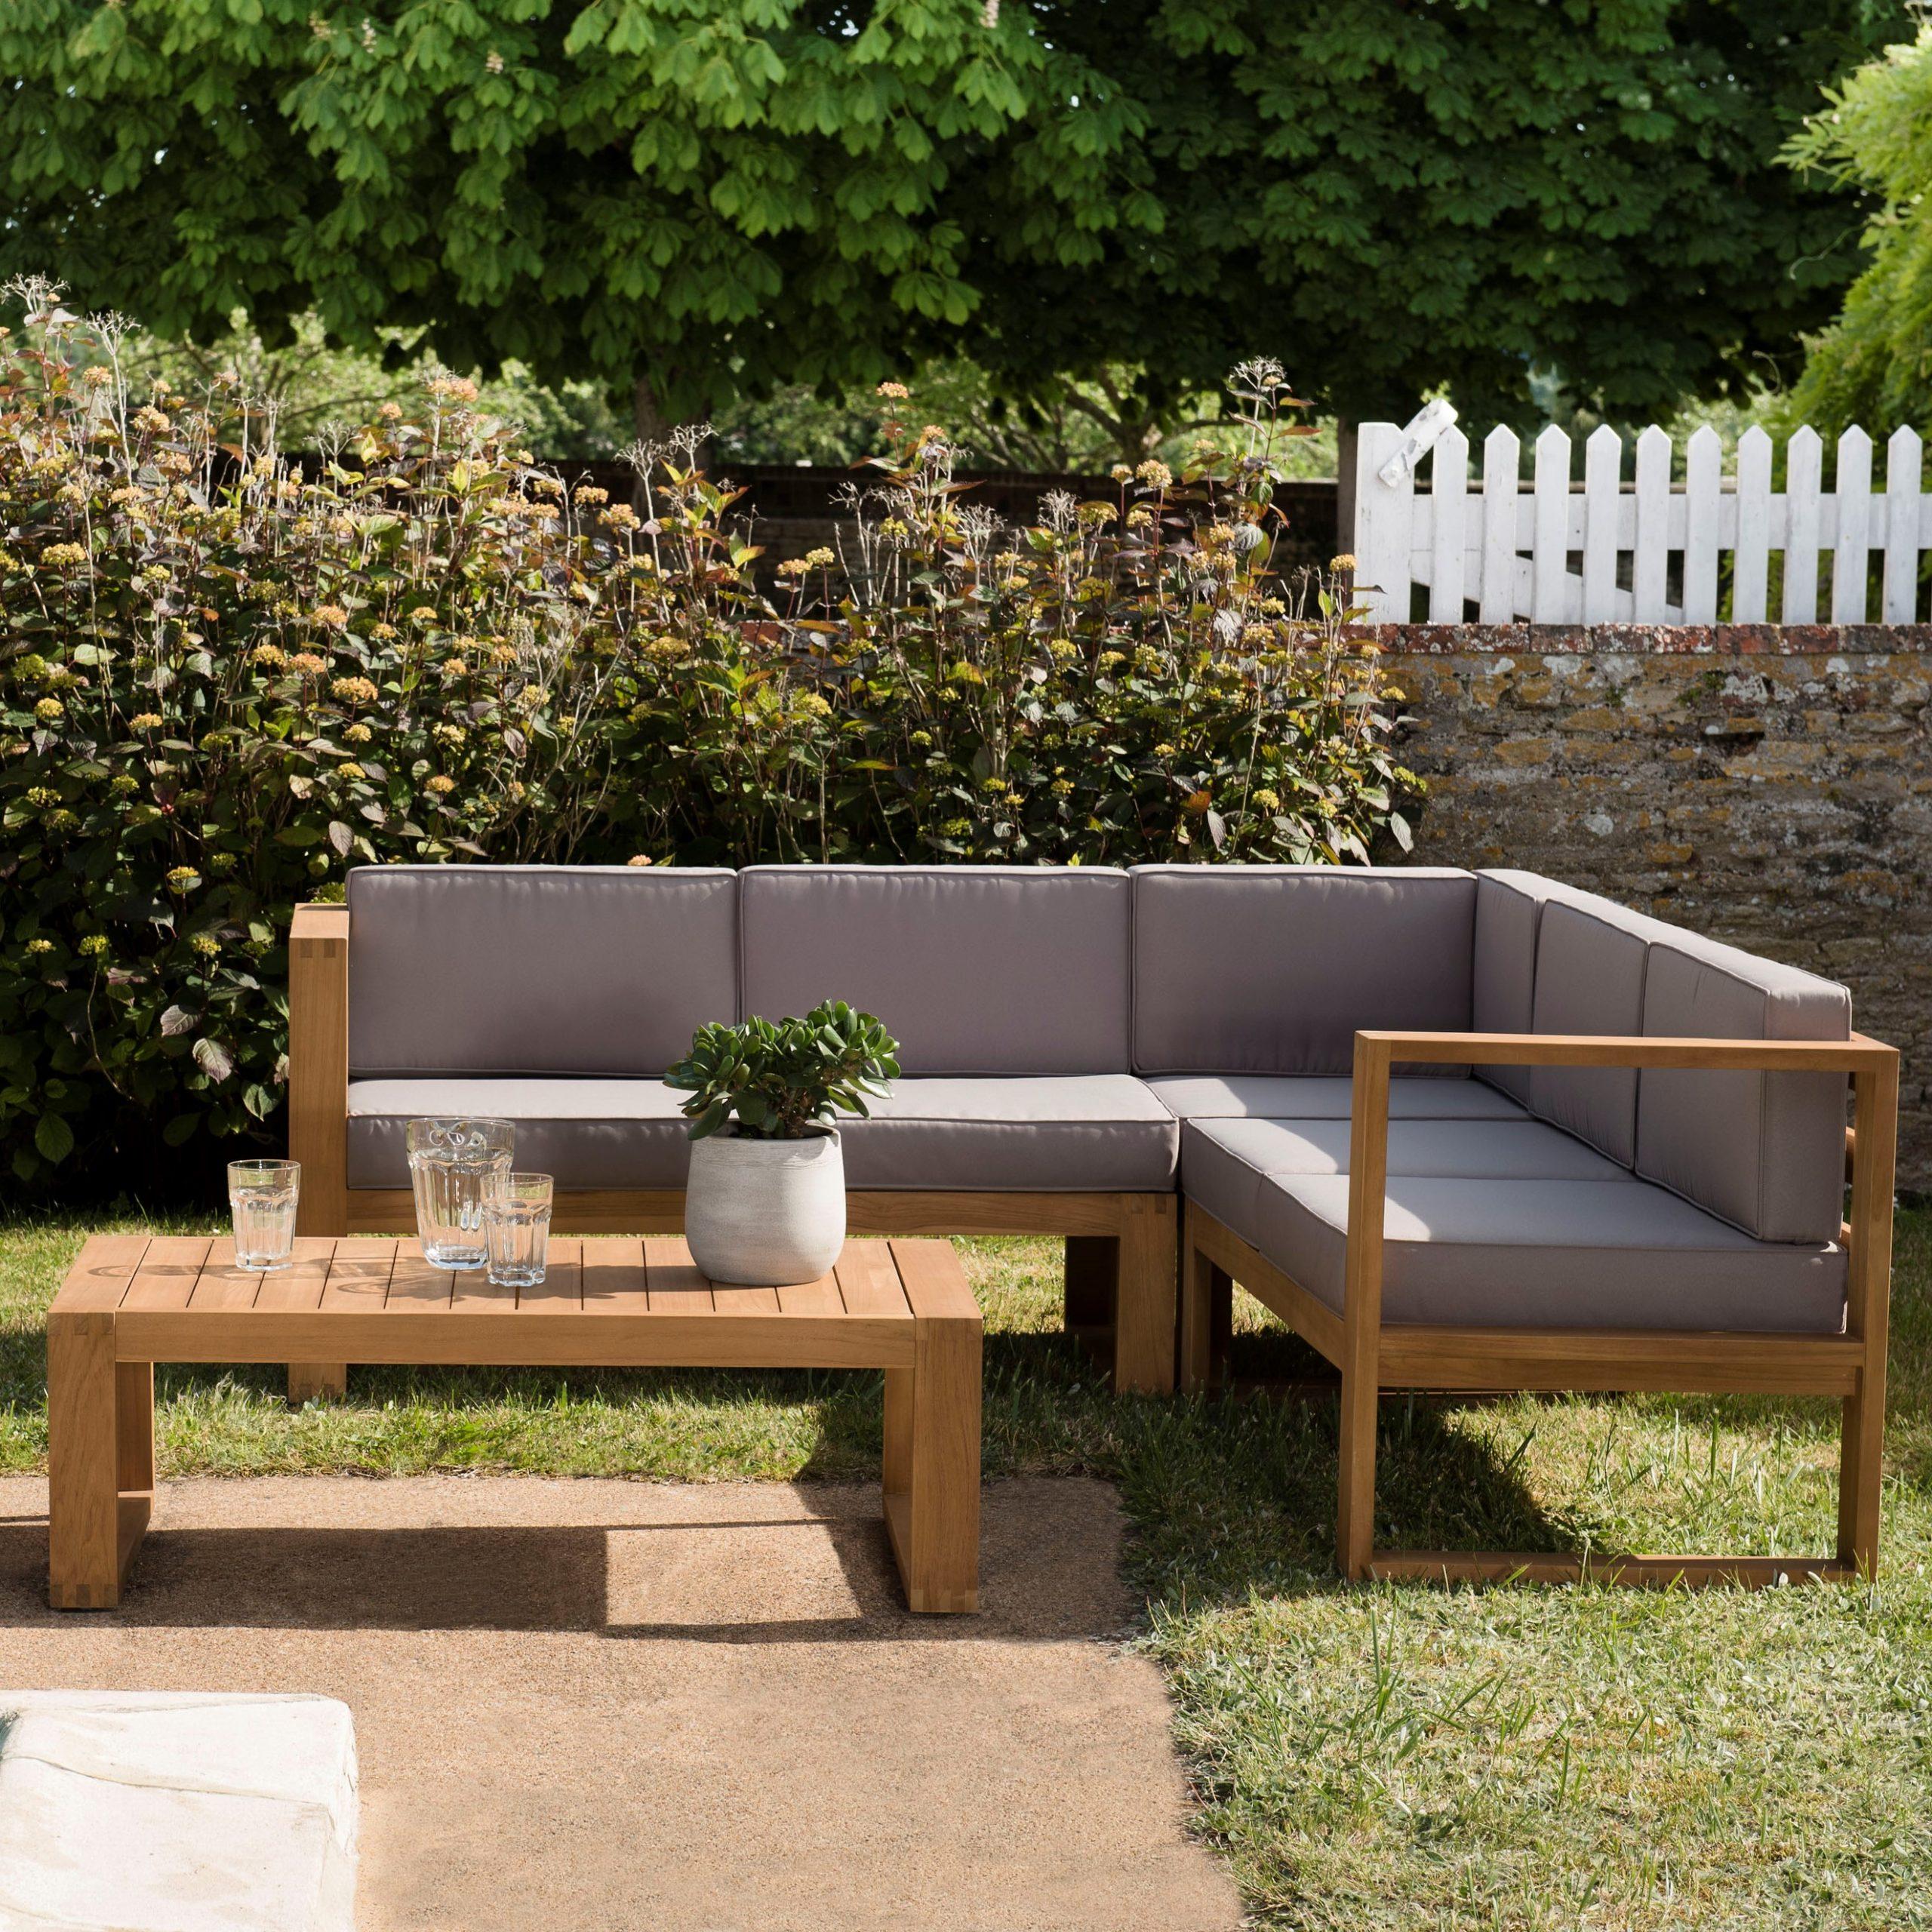 Salon De Jardin En Teck Summer (1 Canapé D'angle 5 Places, 1 Table Basse) avec Canapé D Angle De Jardin